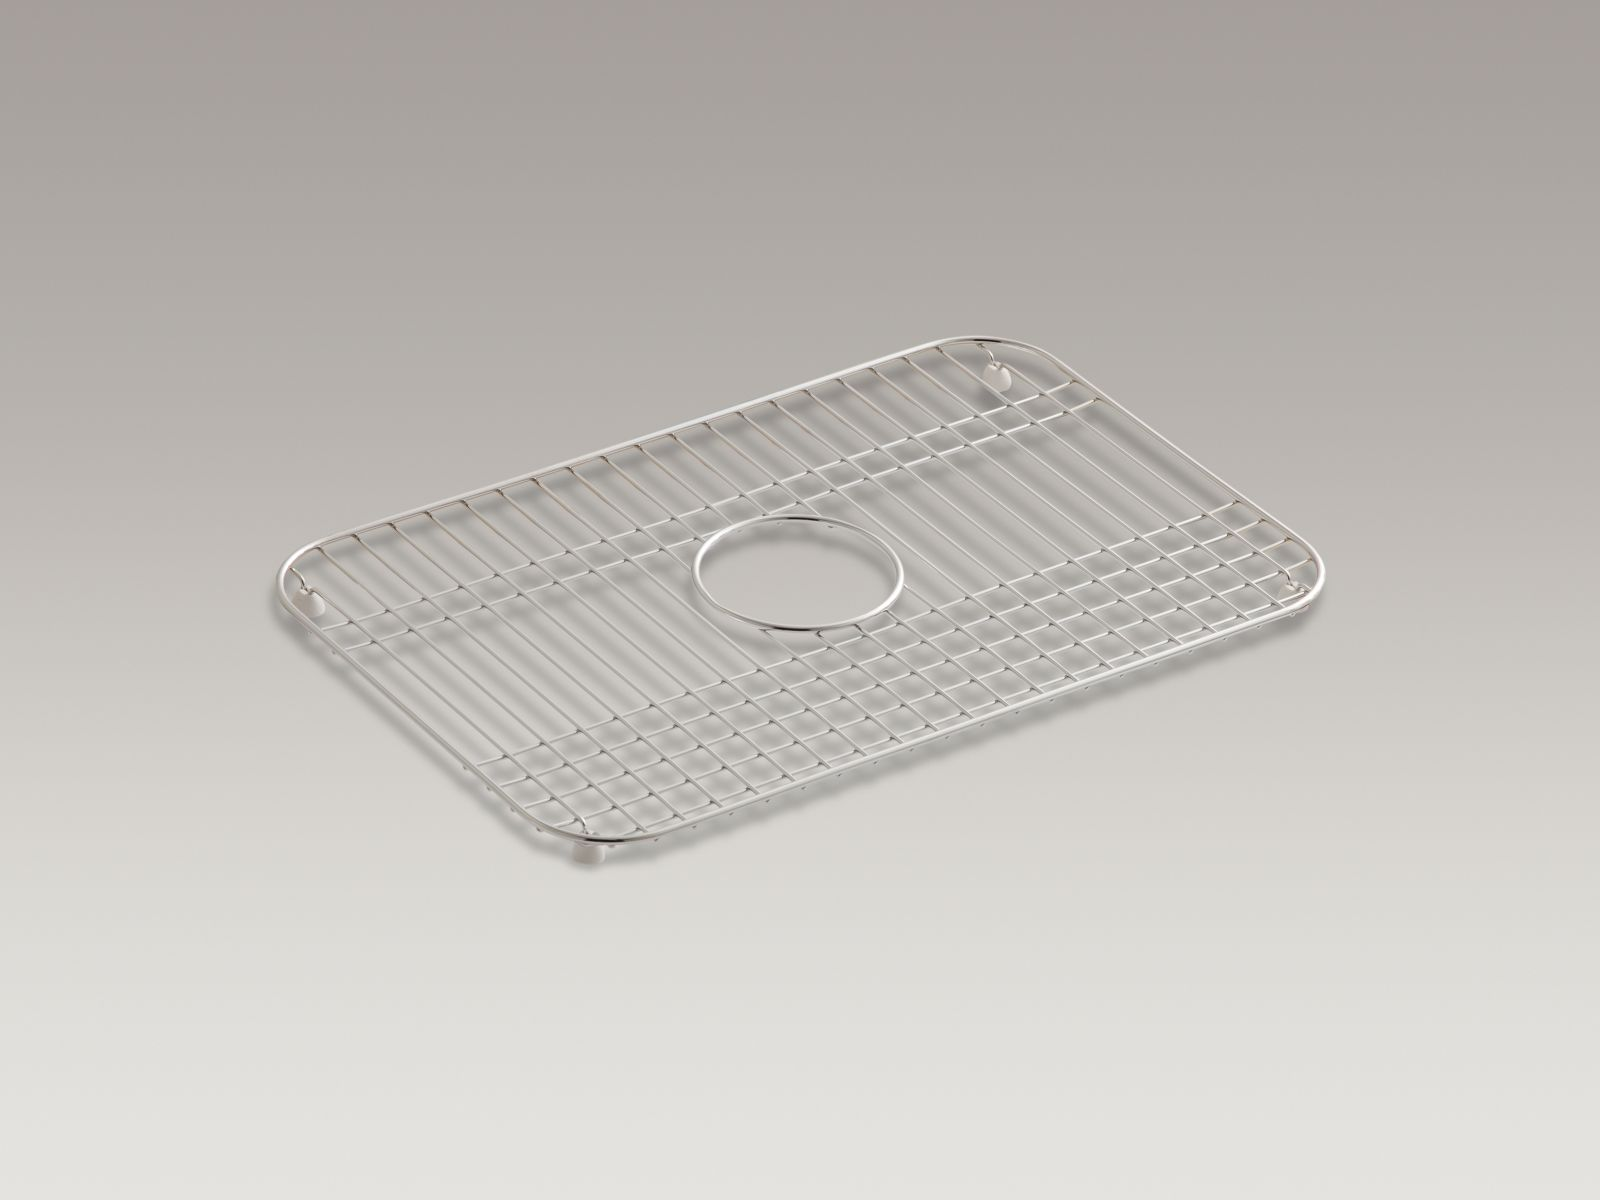 "Kohler K-6003-ST Mayfield Stainless Steel 19"" x 13"" Sink Rack"